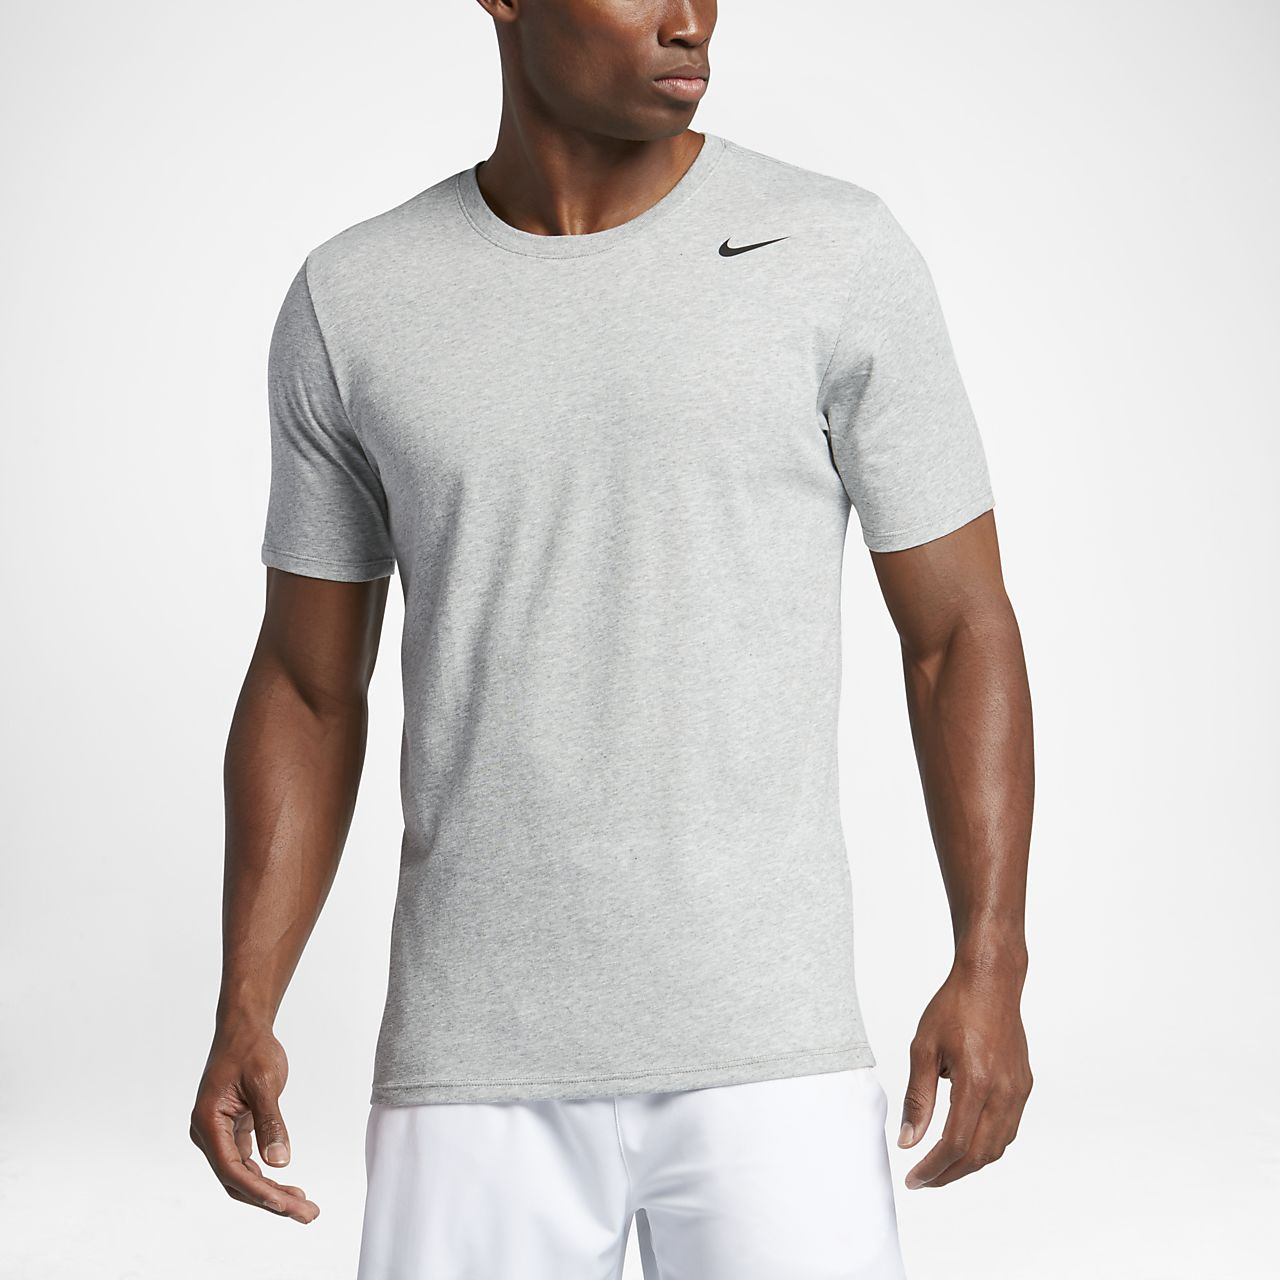 91a765384c43b Nike Dri-FIT Camiseta de entrenamiento de manga corta - Hombre. Nike ...